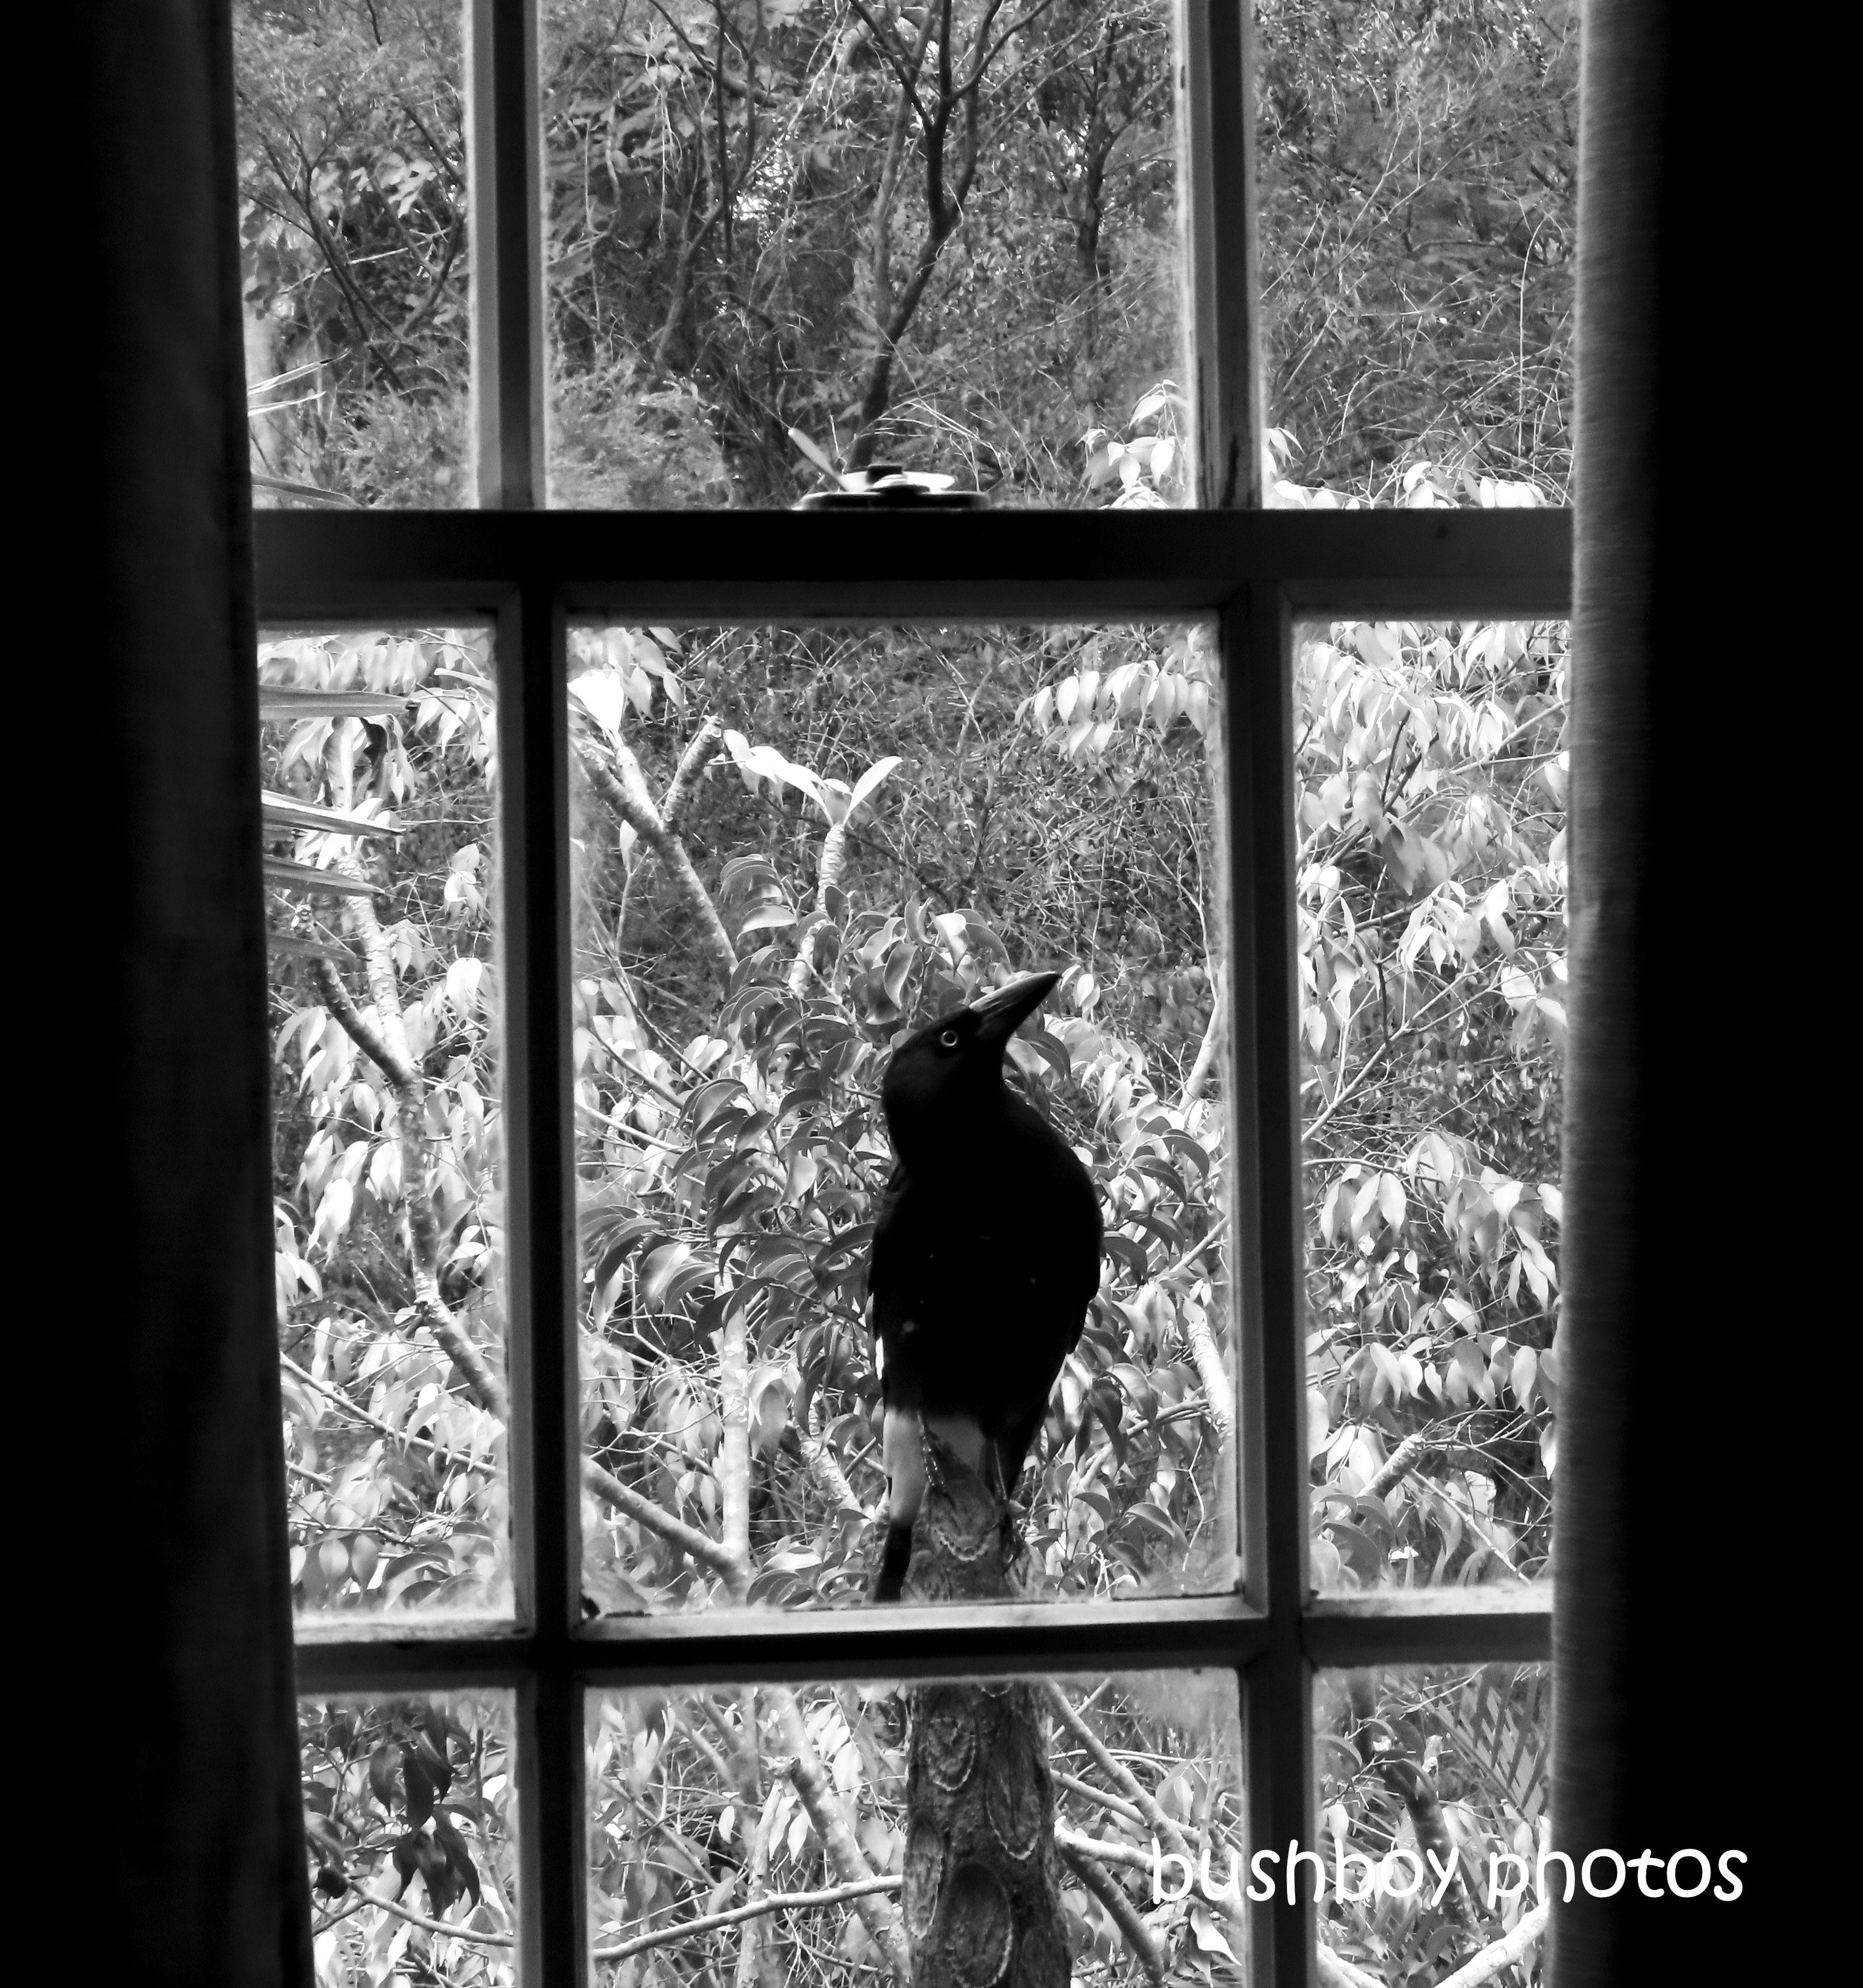 190816_blog_challenge_blackandwhite_currawong_window